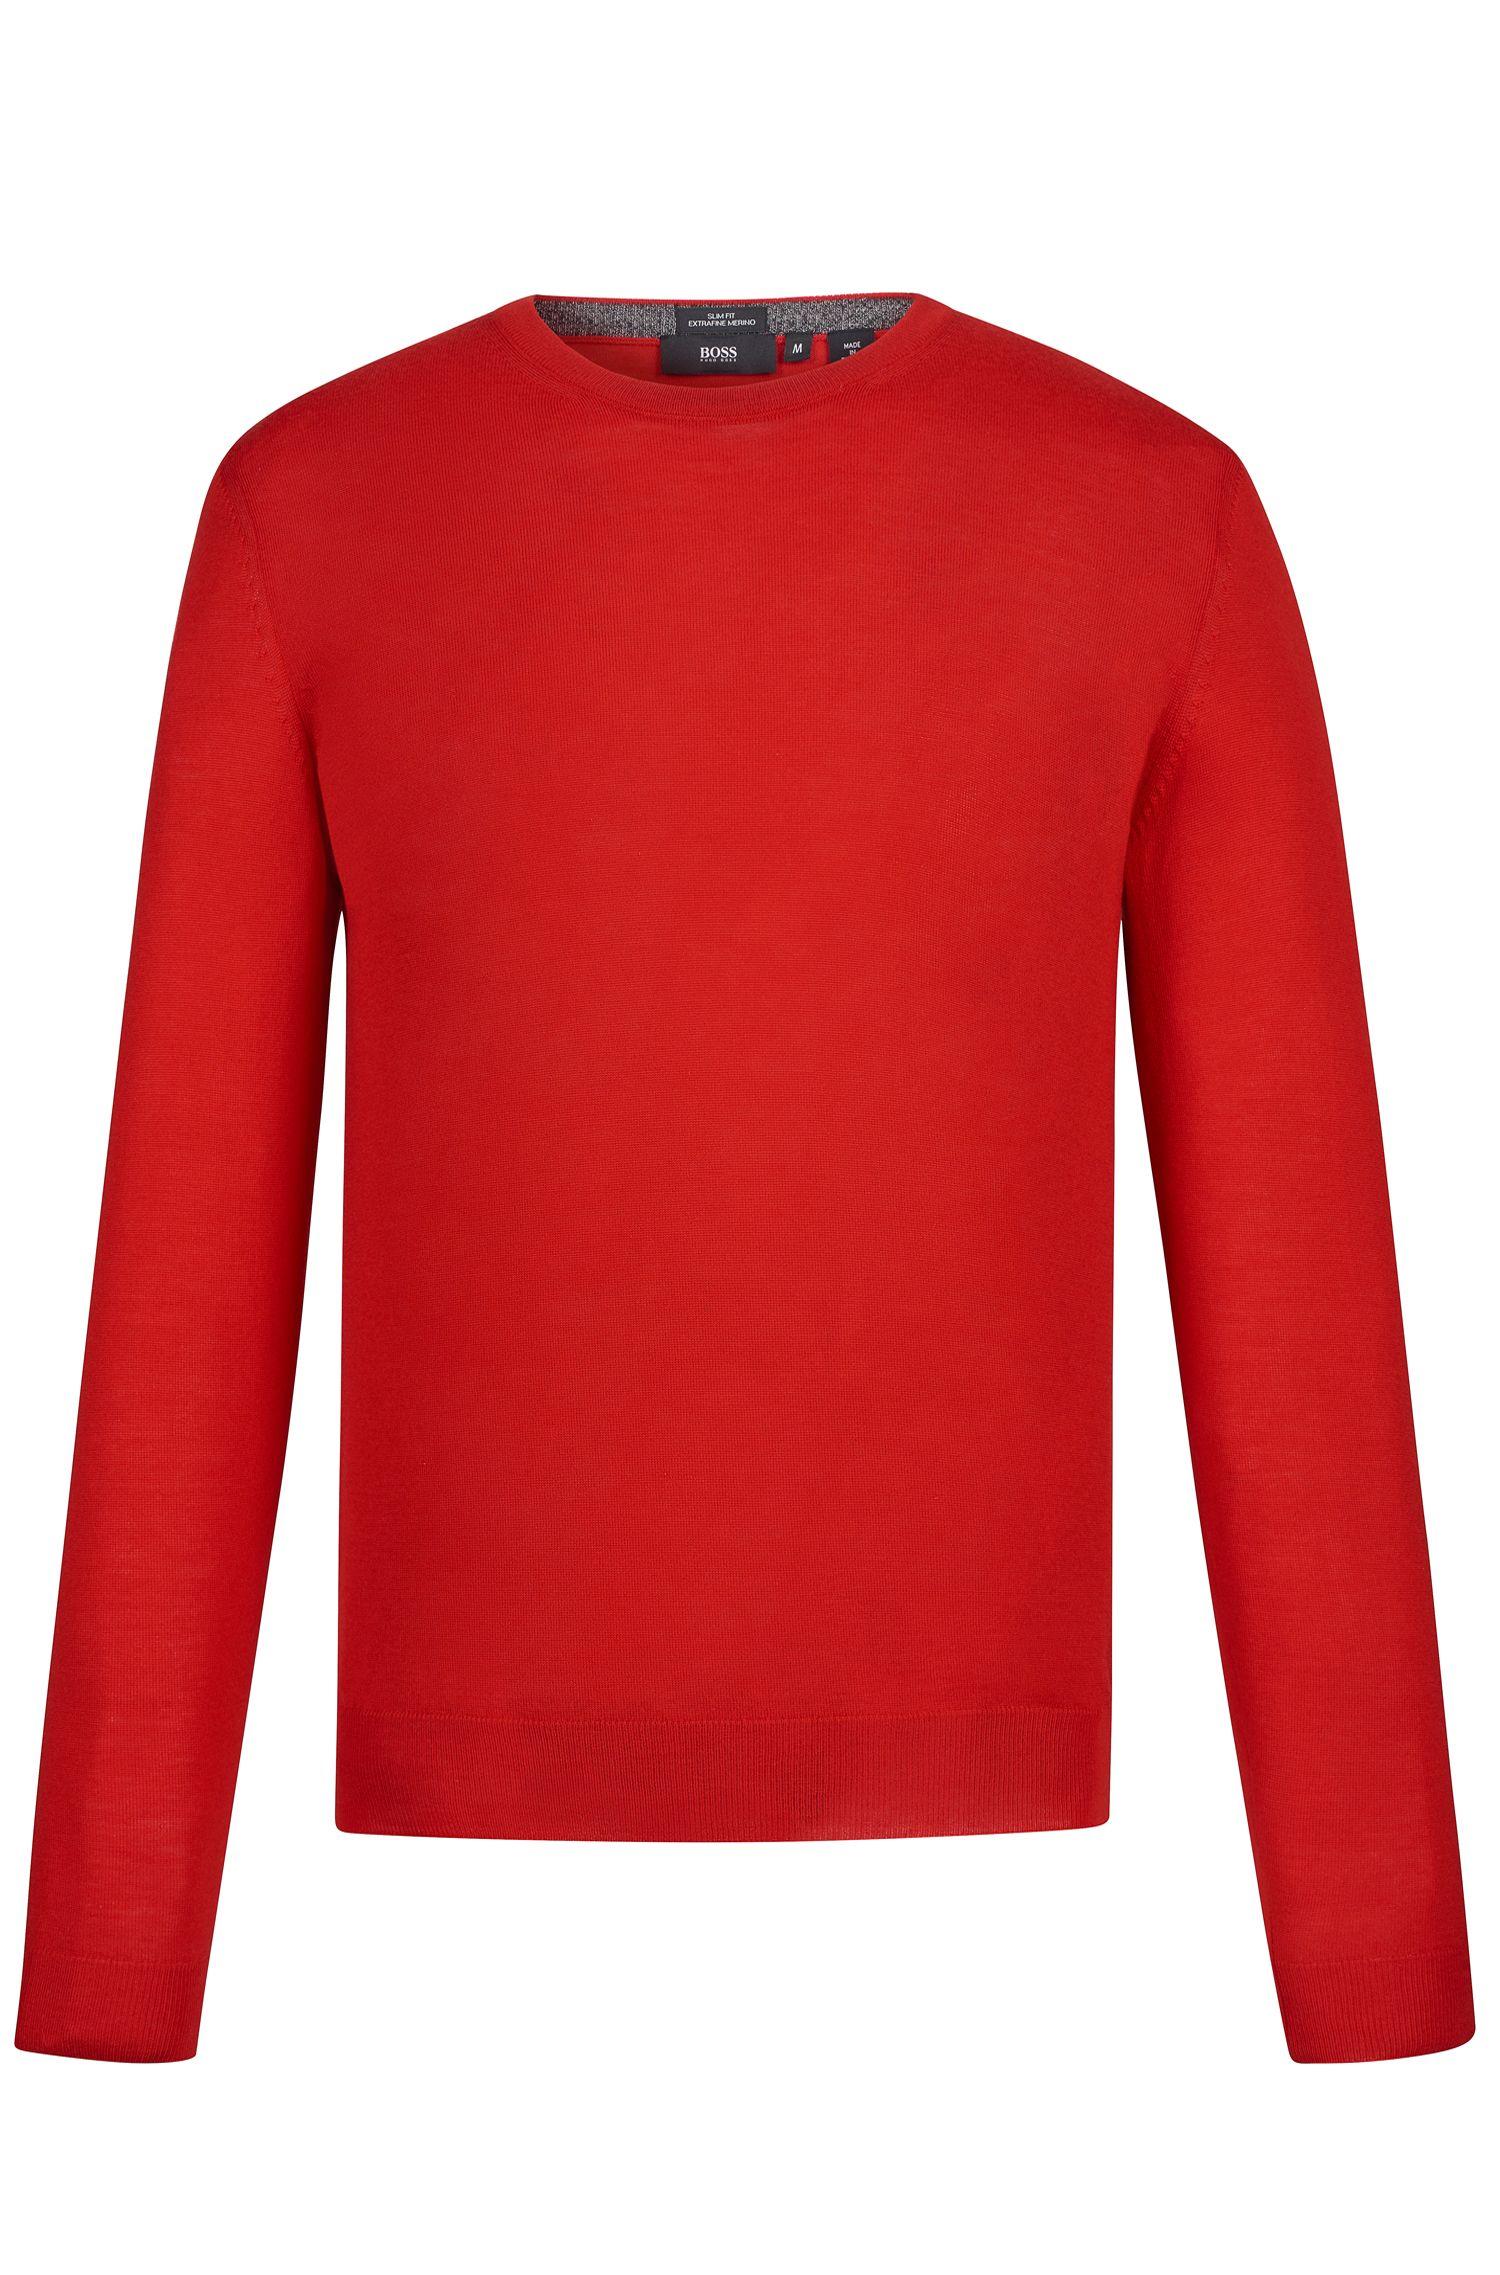 'Leno-B'   Merino Virgin Wool Sweater